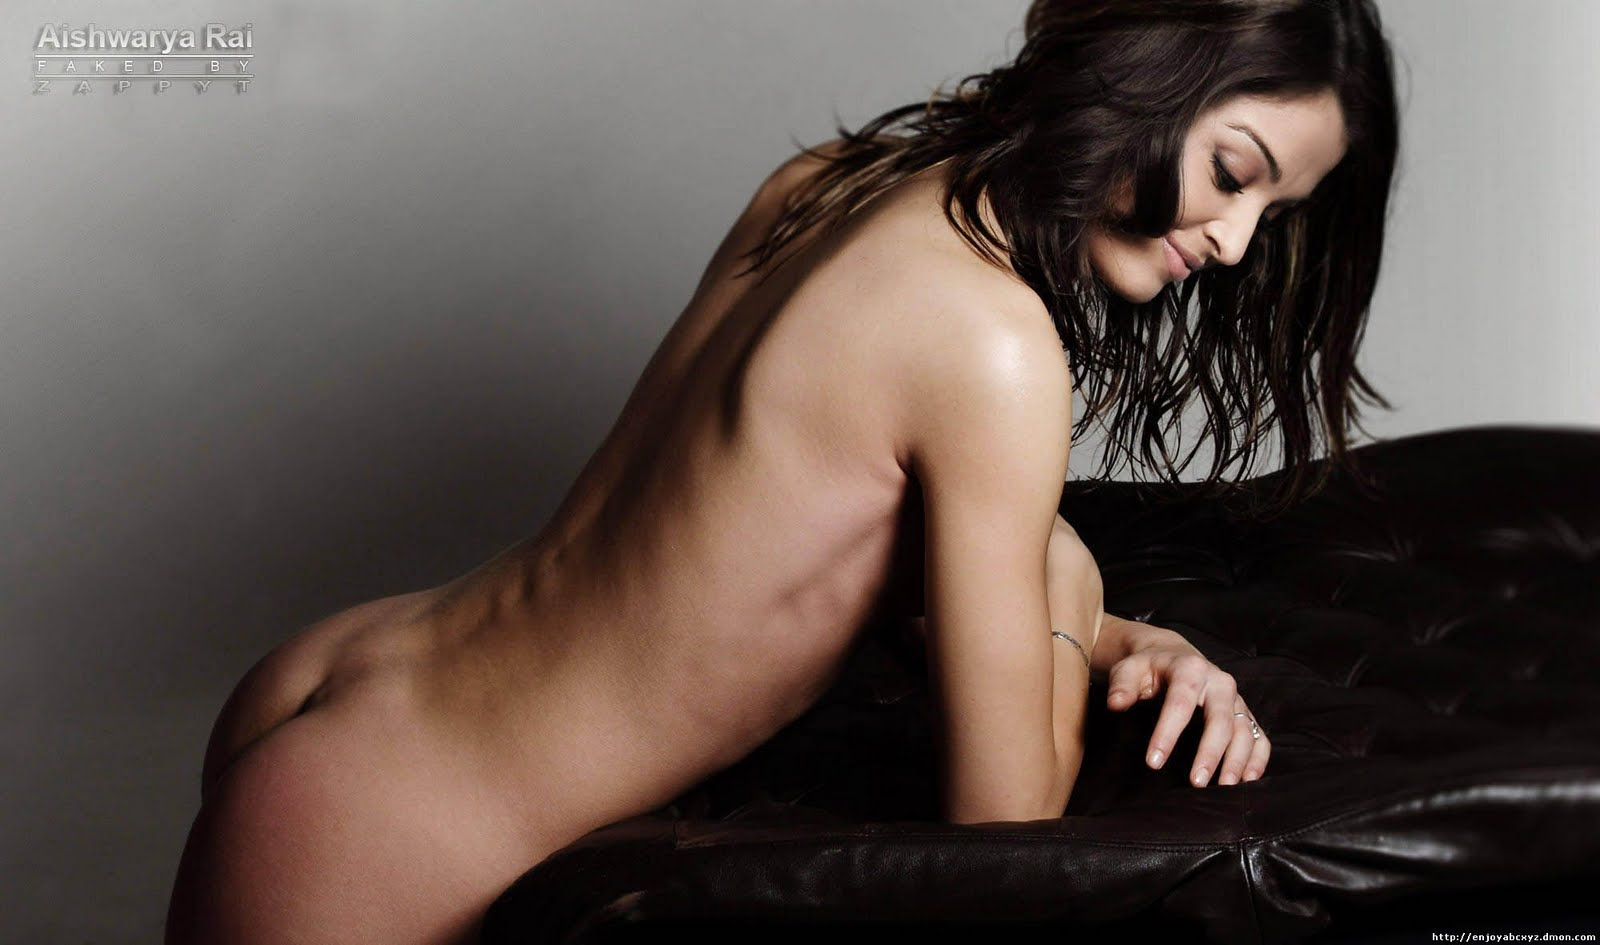 Really. naked bollywood actress aishwarya rai